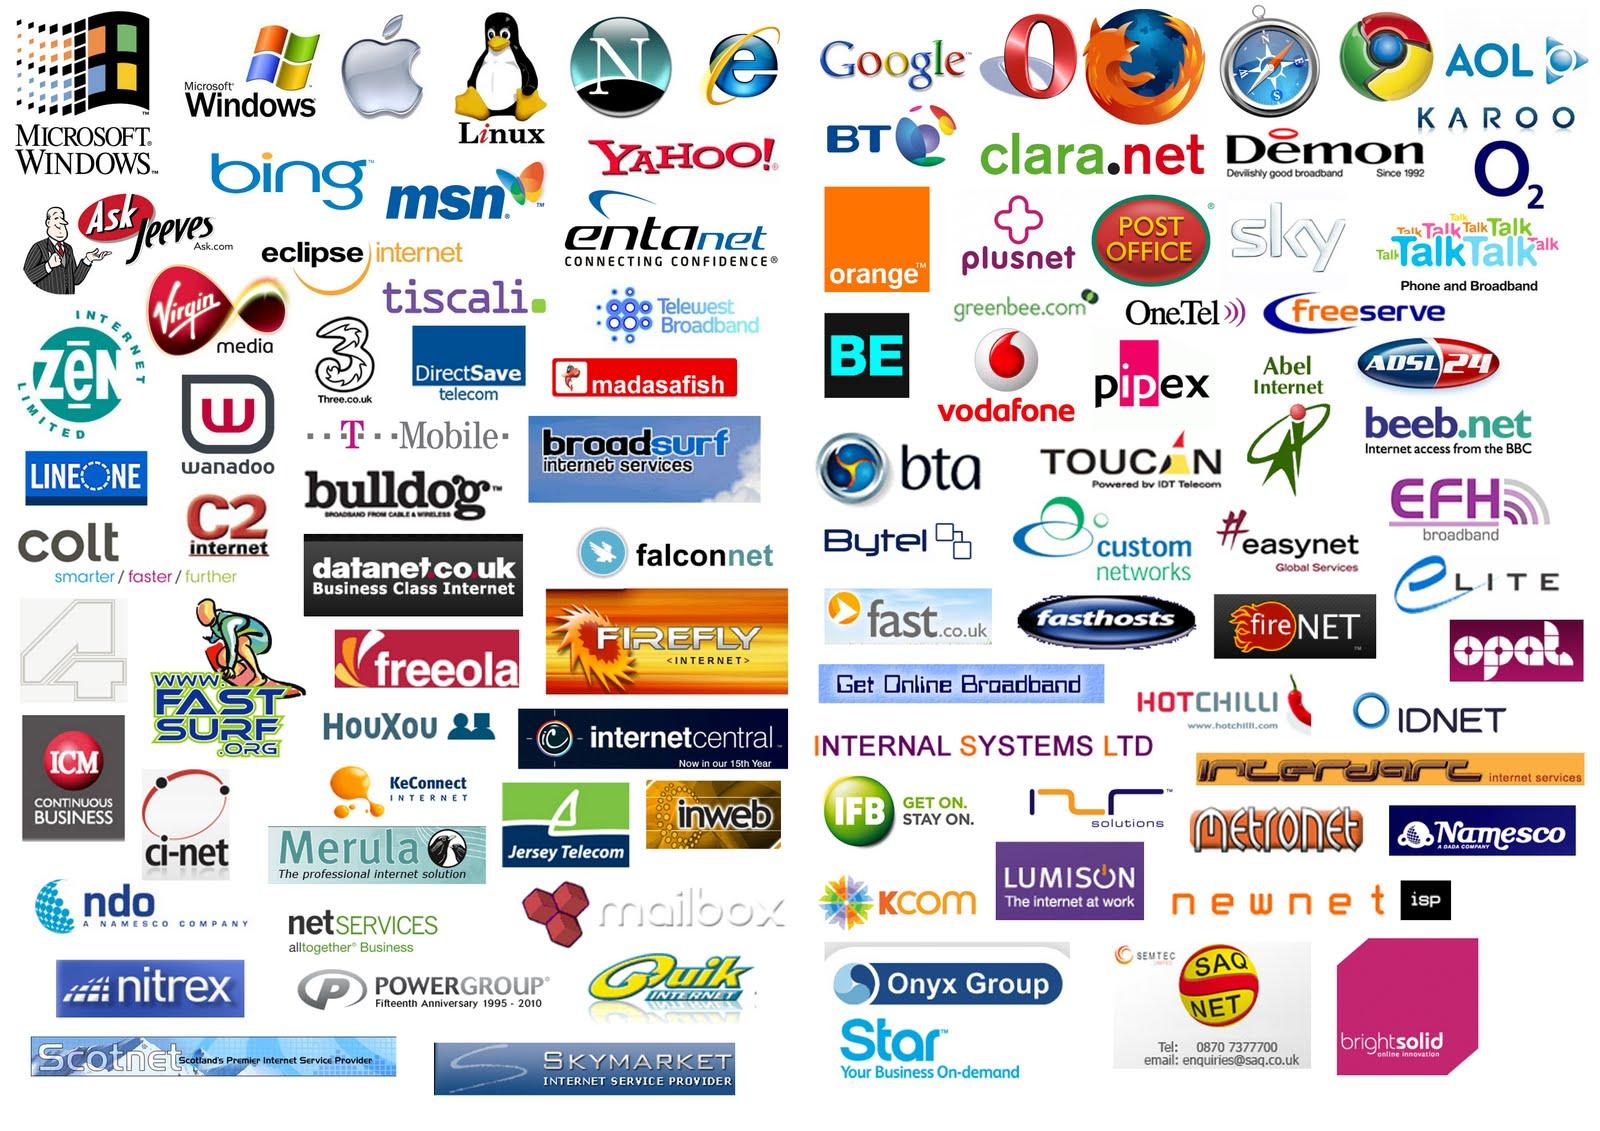 Your Blog - sugerencia de internet Internet Service Company Logos And Names